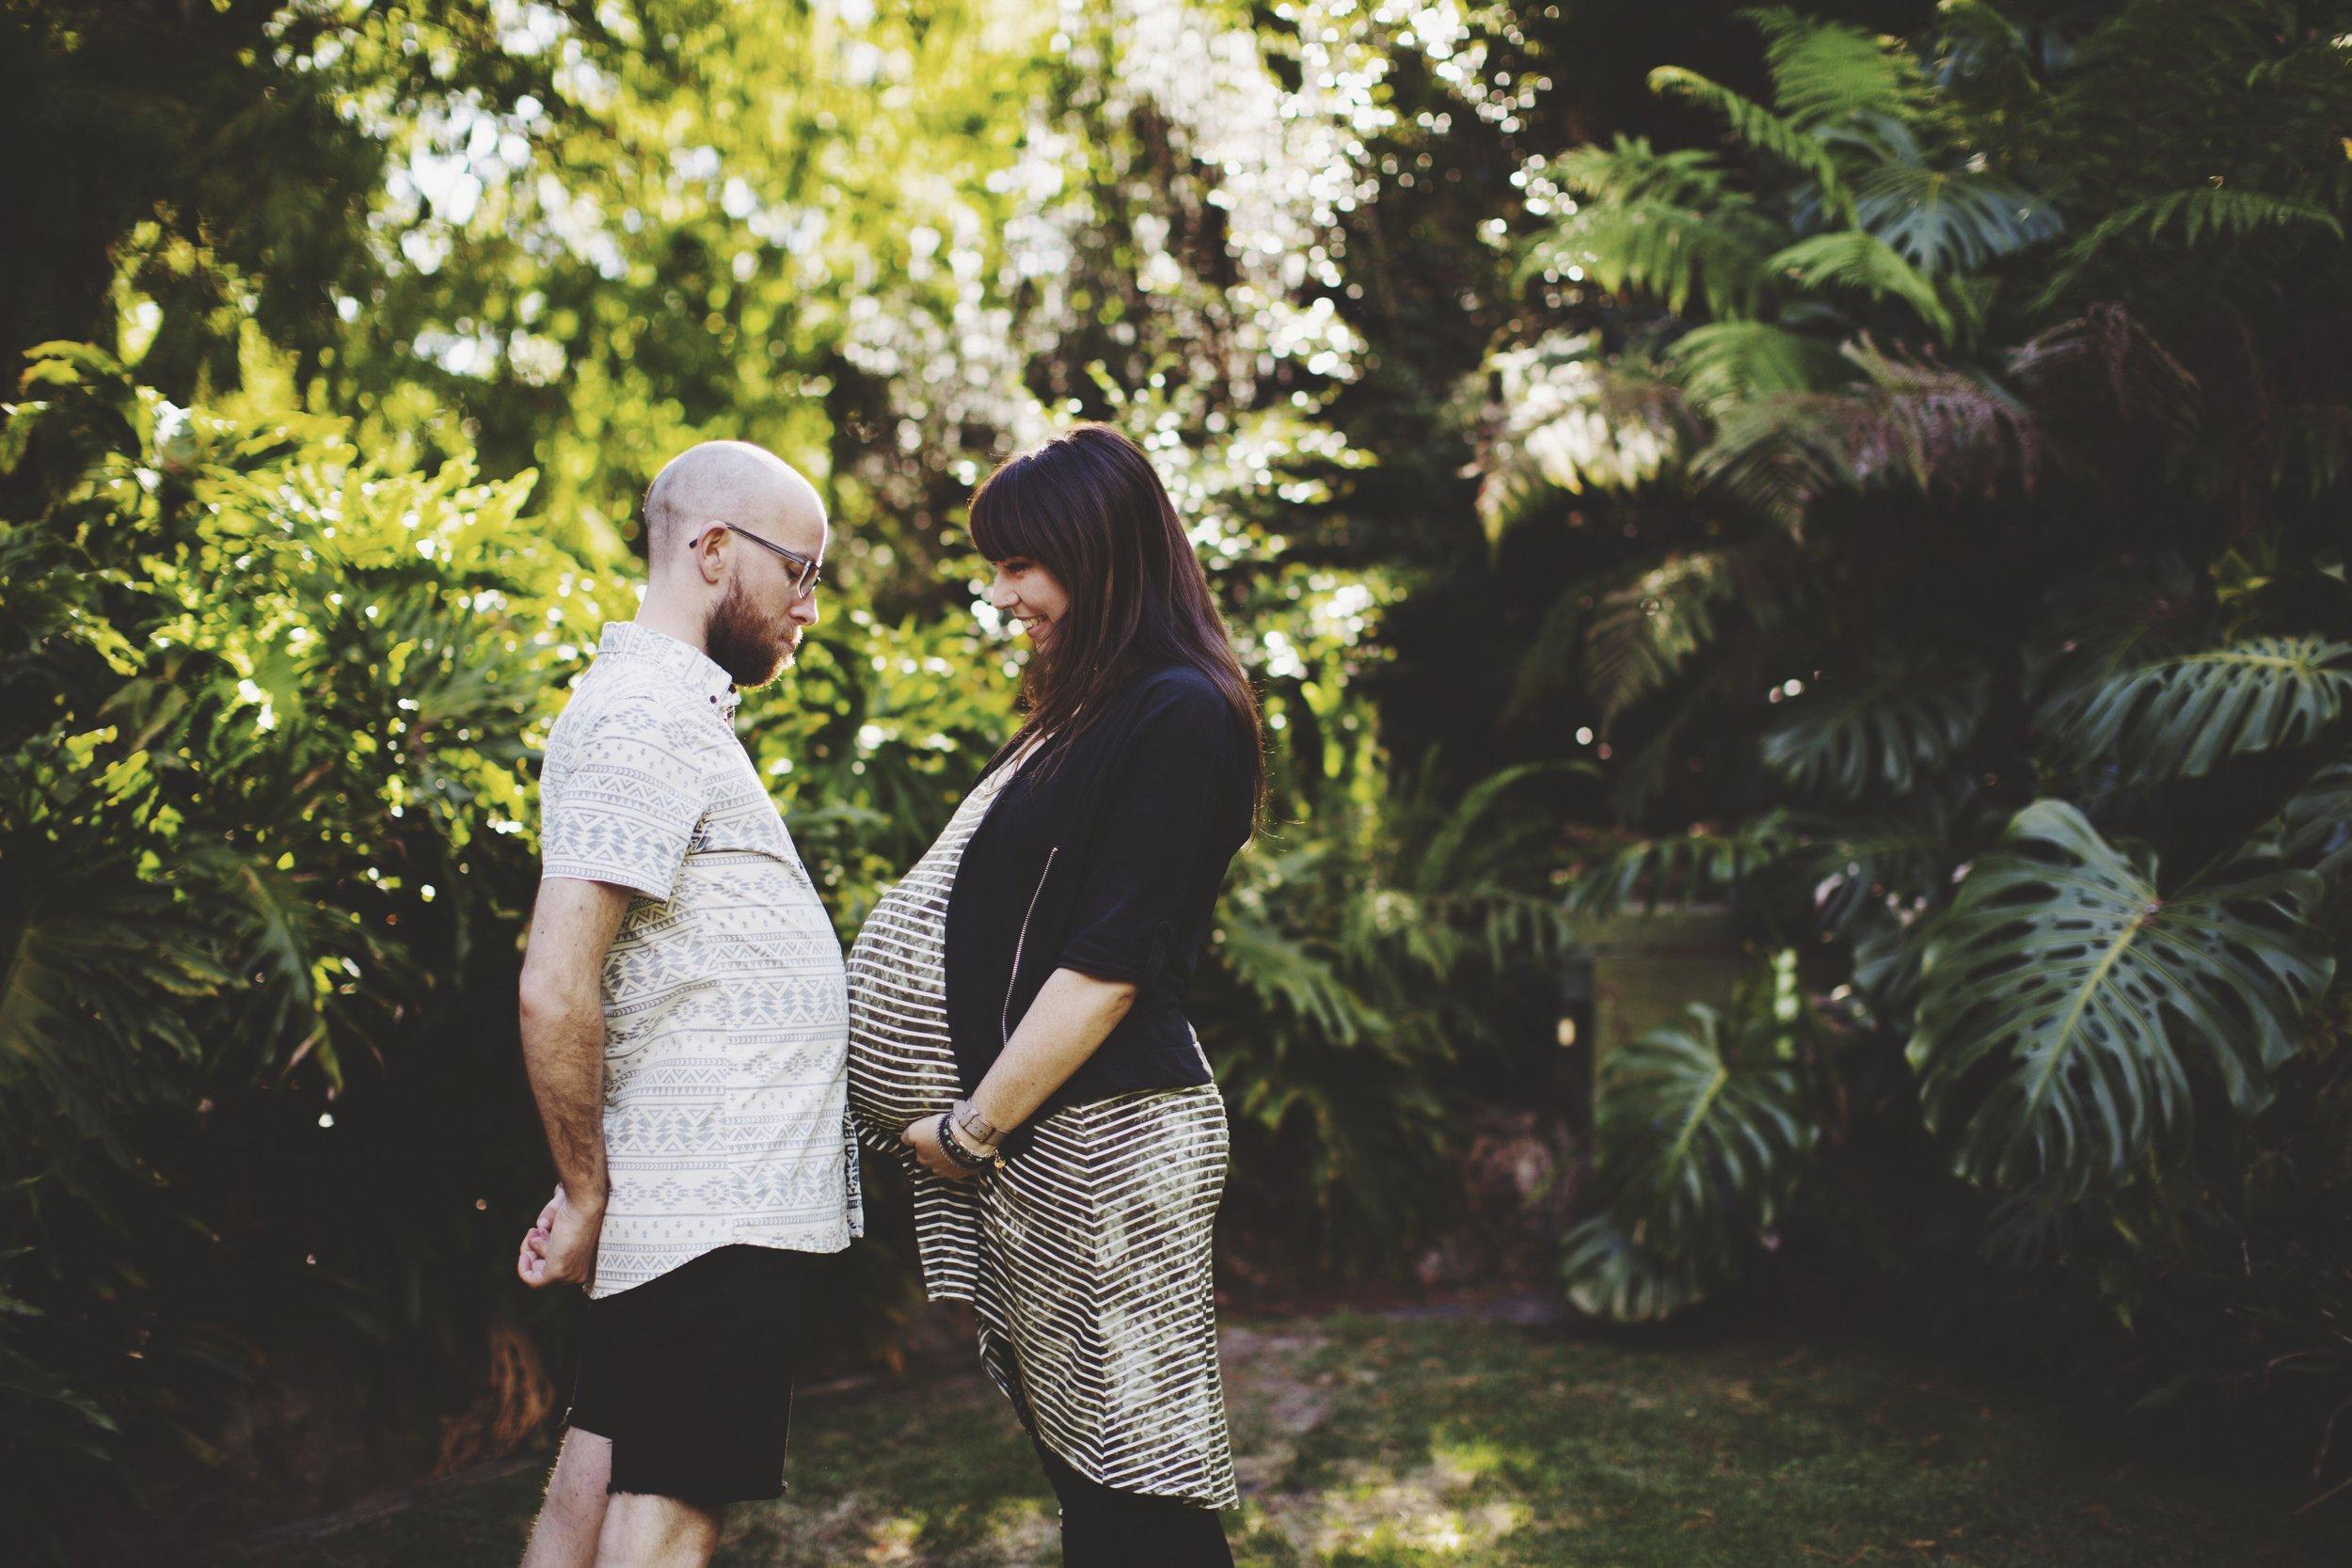 sydney pregnancy announcement